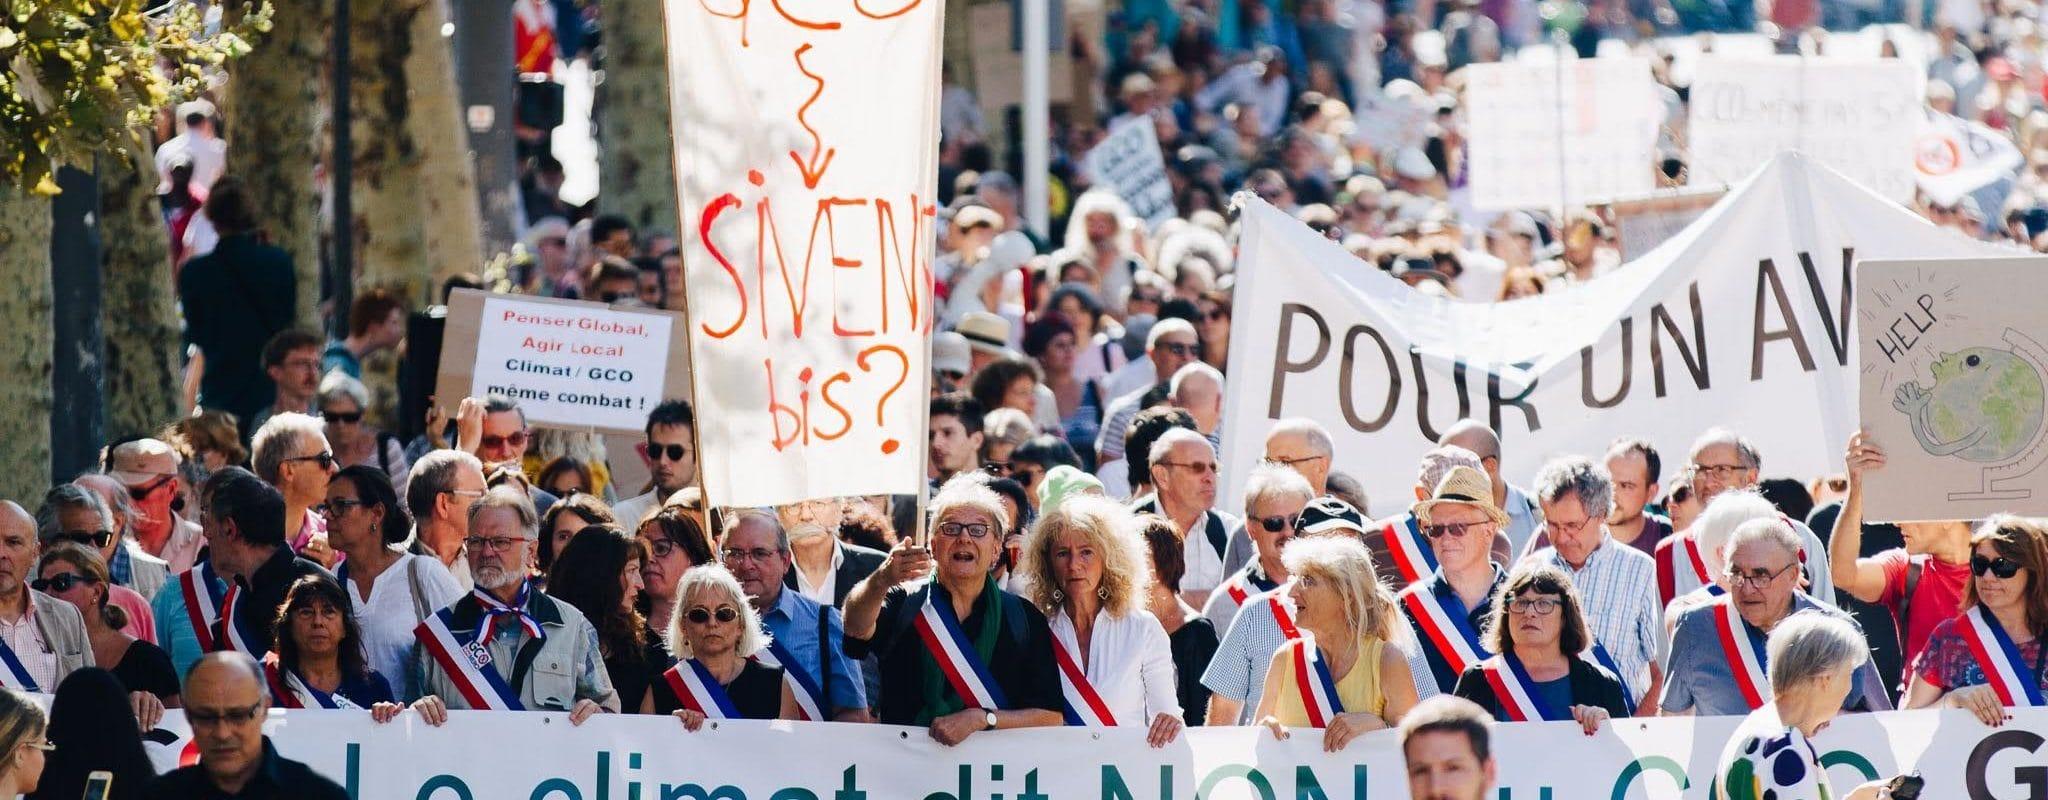 Nouvelle manifestation strasbourgeoise contre le GCO samedi